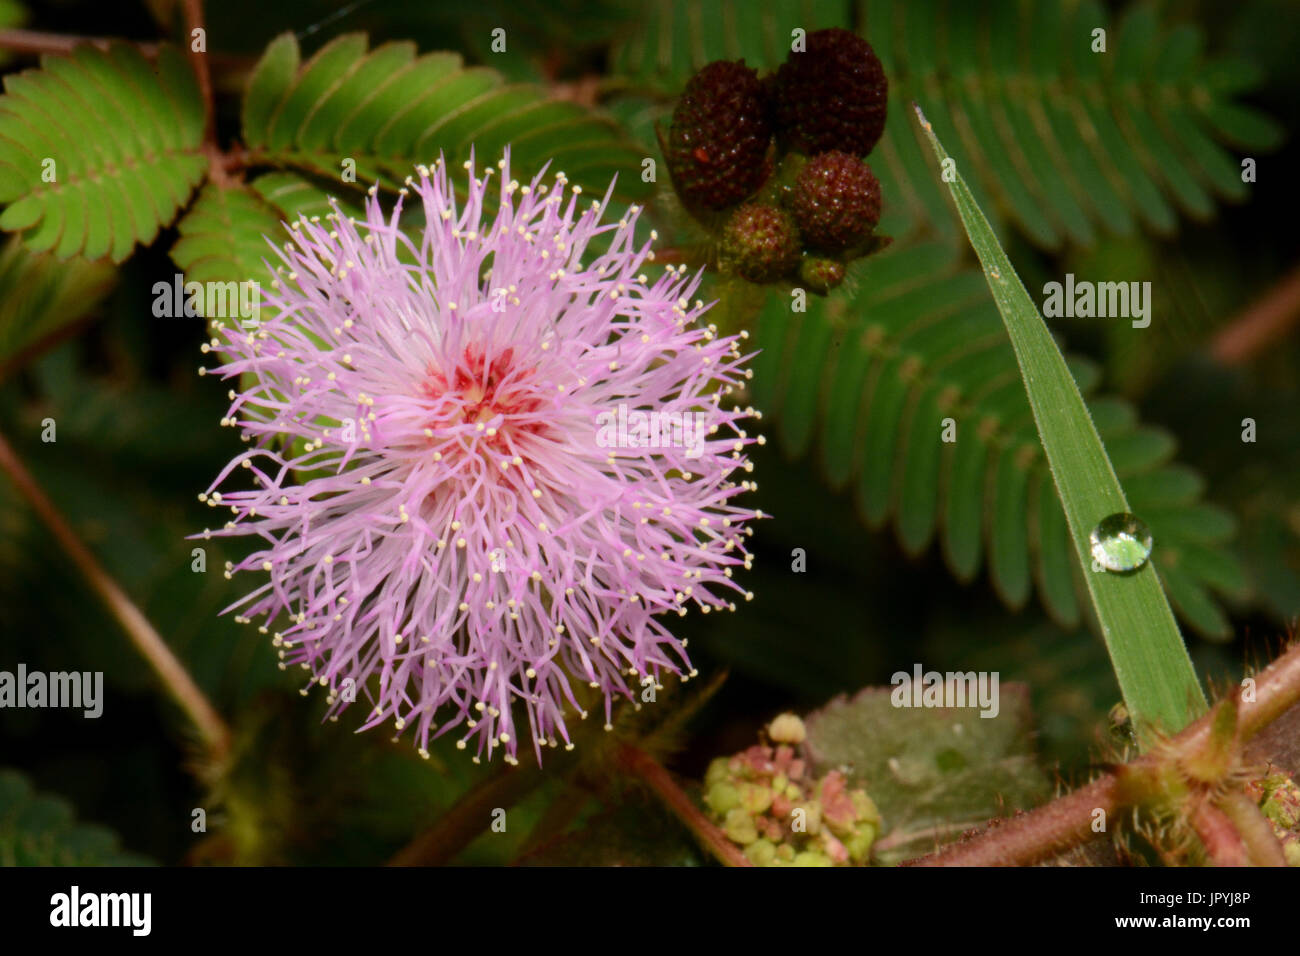 Scham Pflanze Blume - Neukaledonien Stockfoto, Bild: 151812438 - Alamy